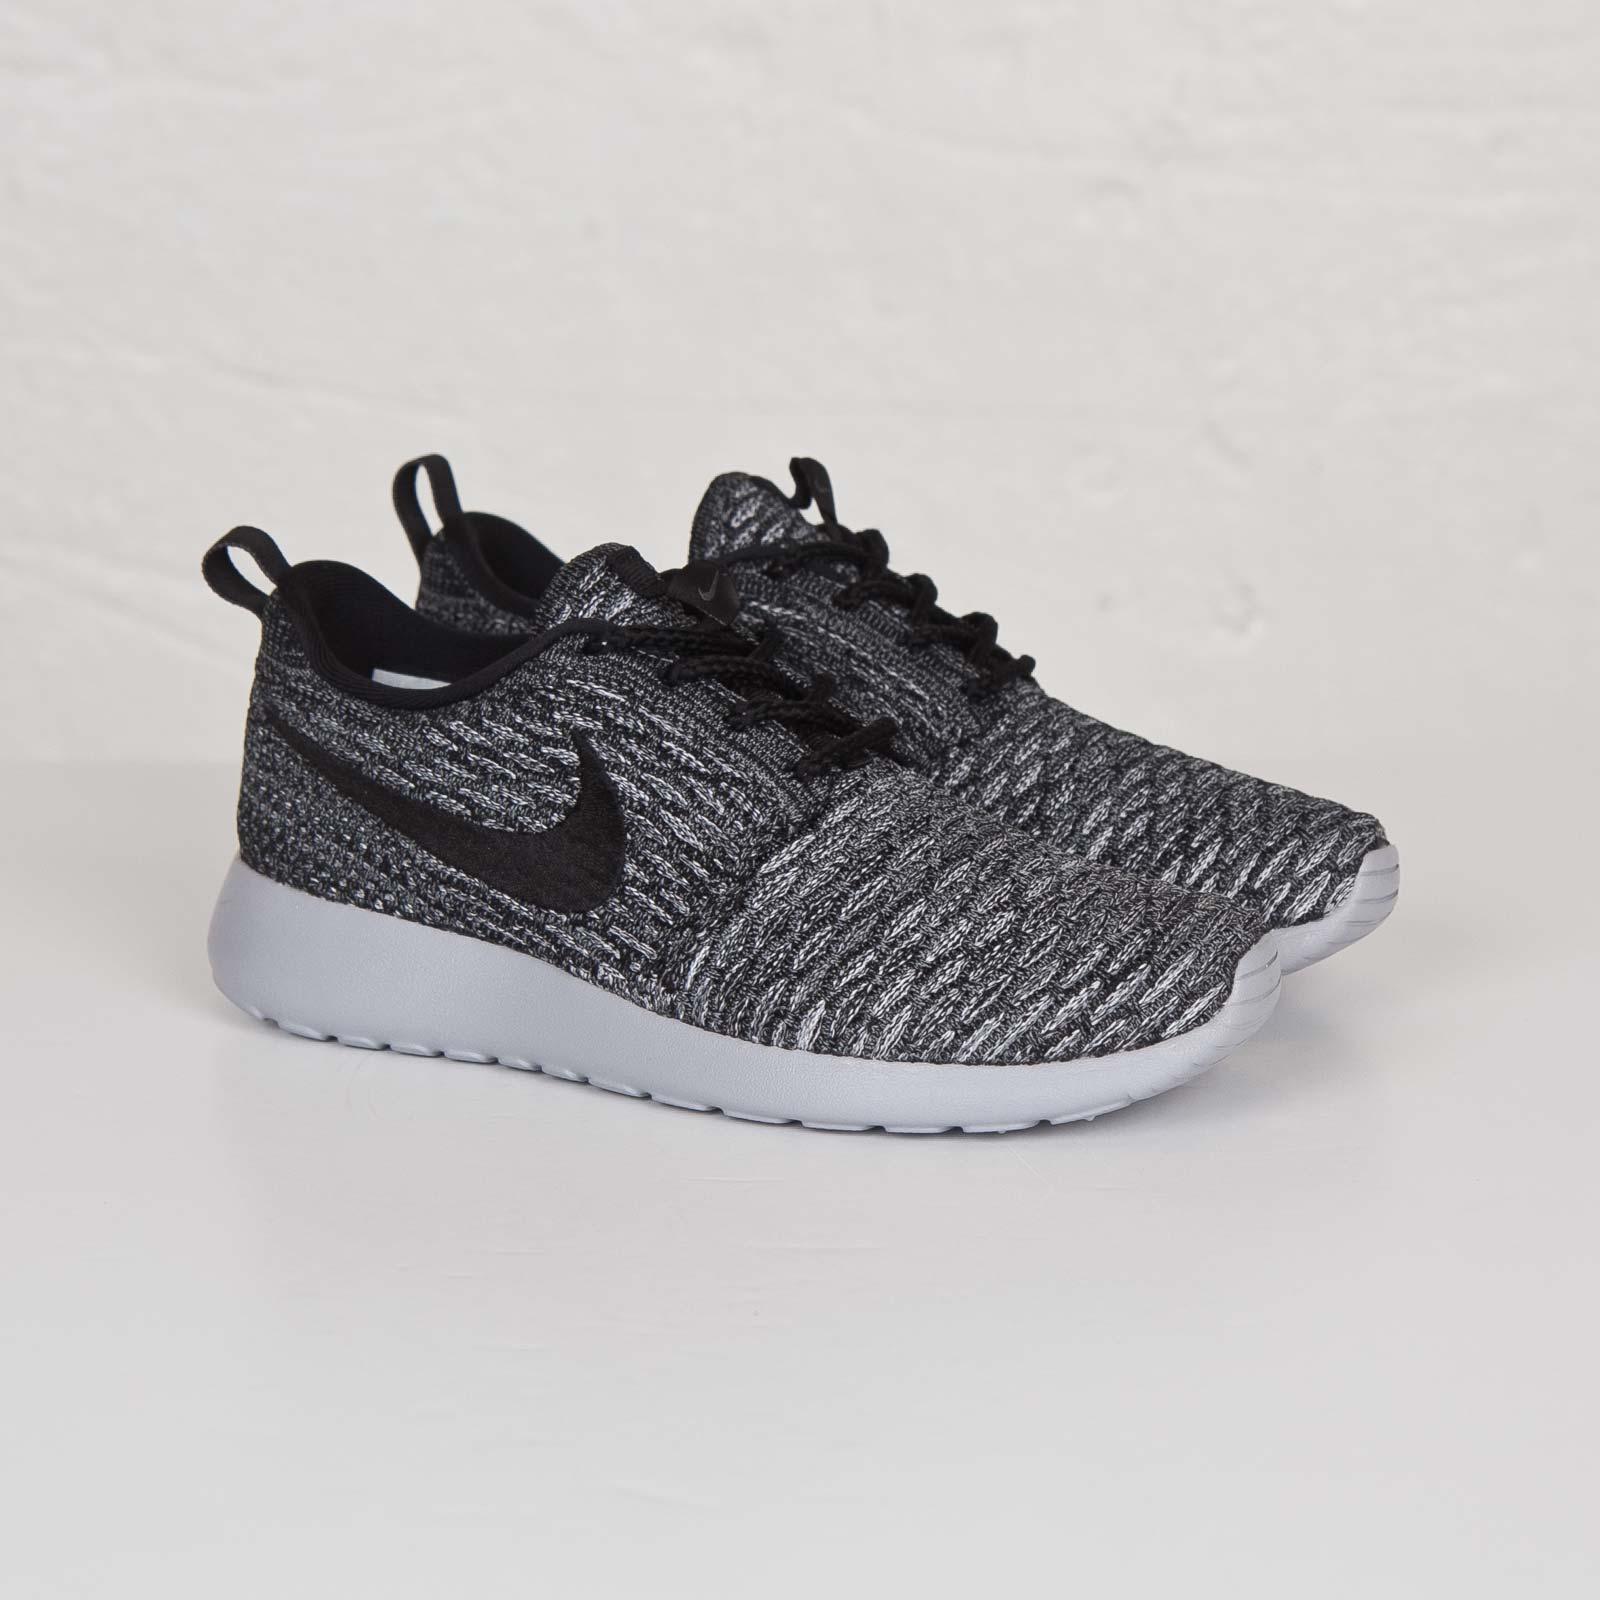 Nike Wmns Roshe One Flyknit - 704927